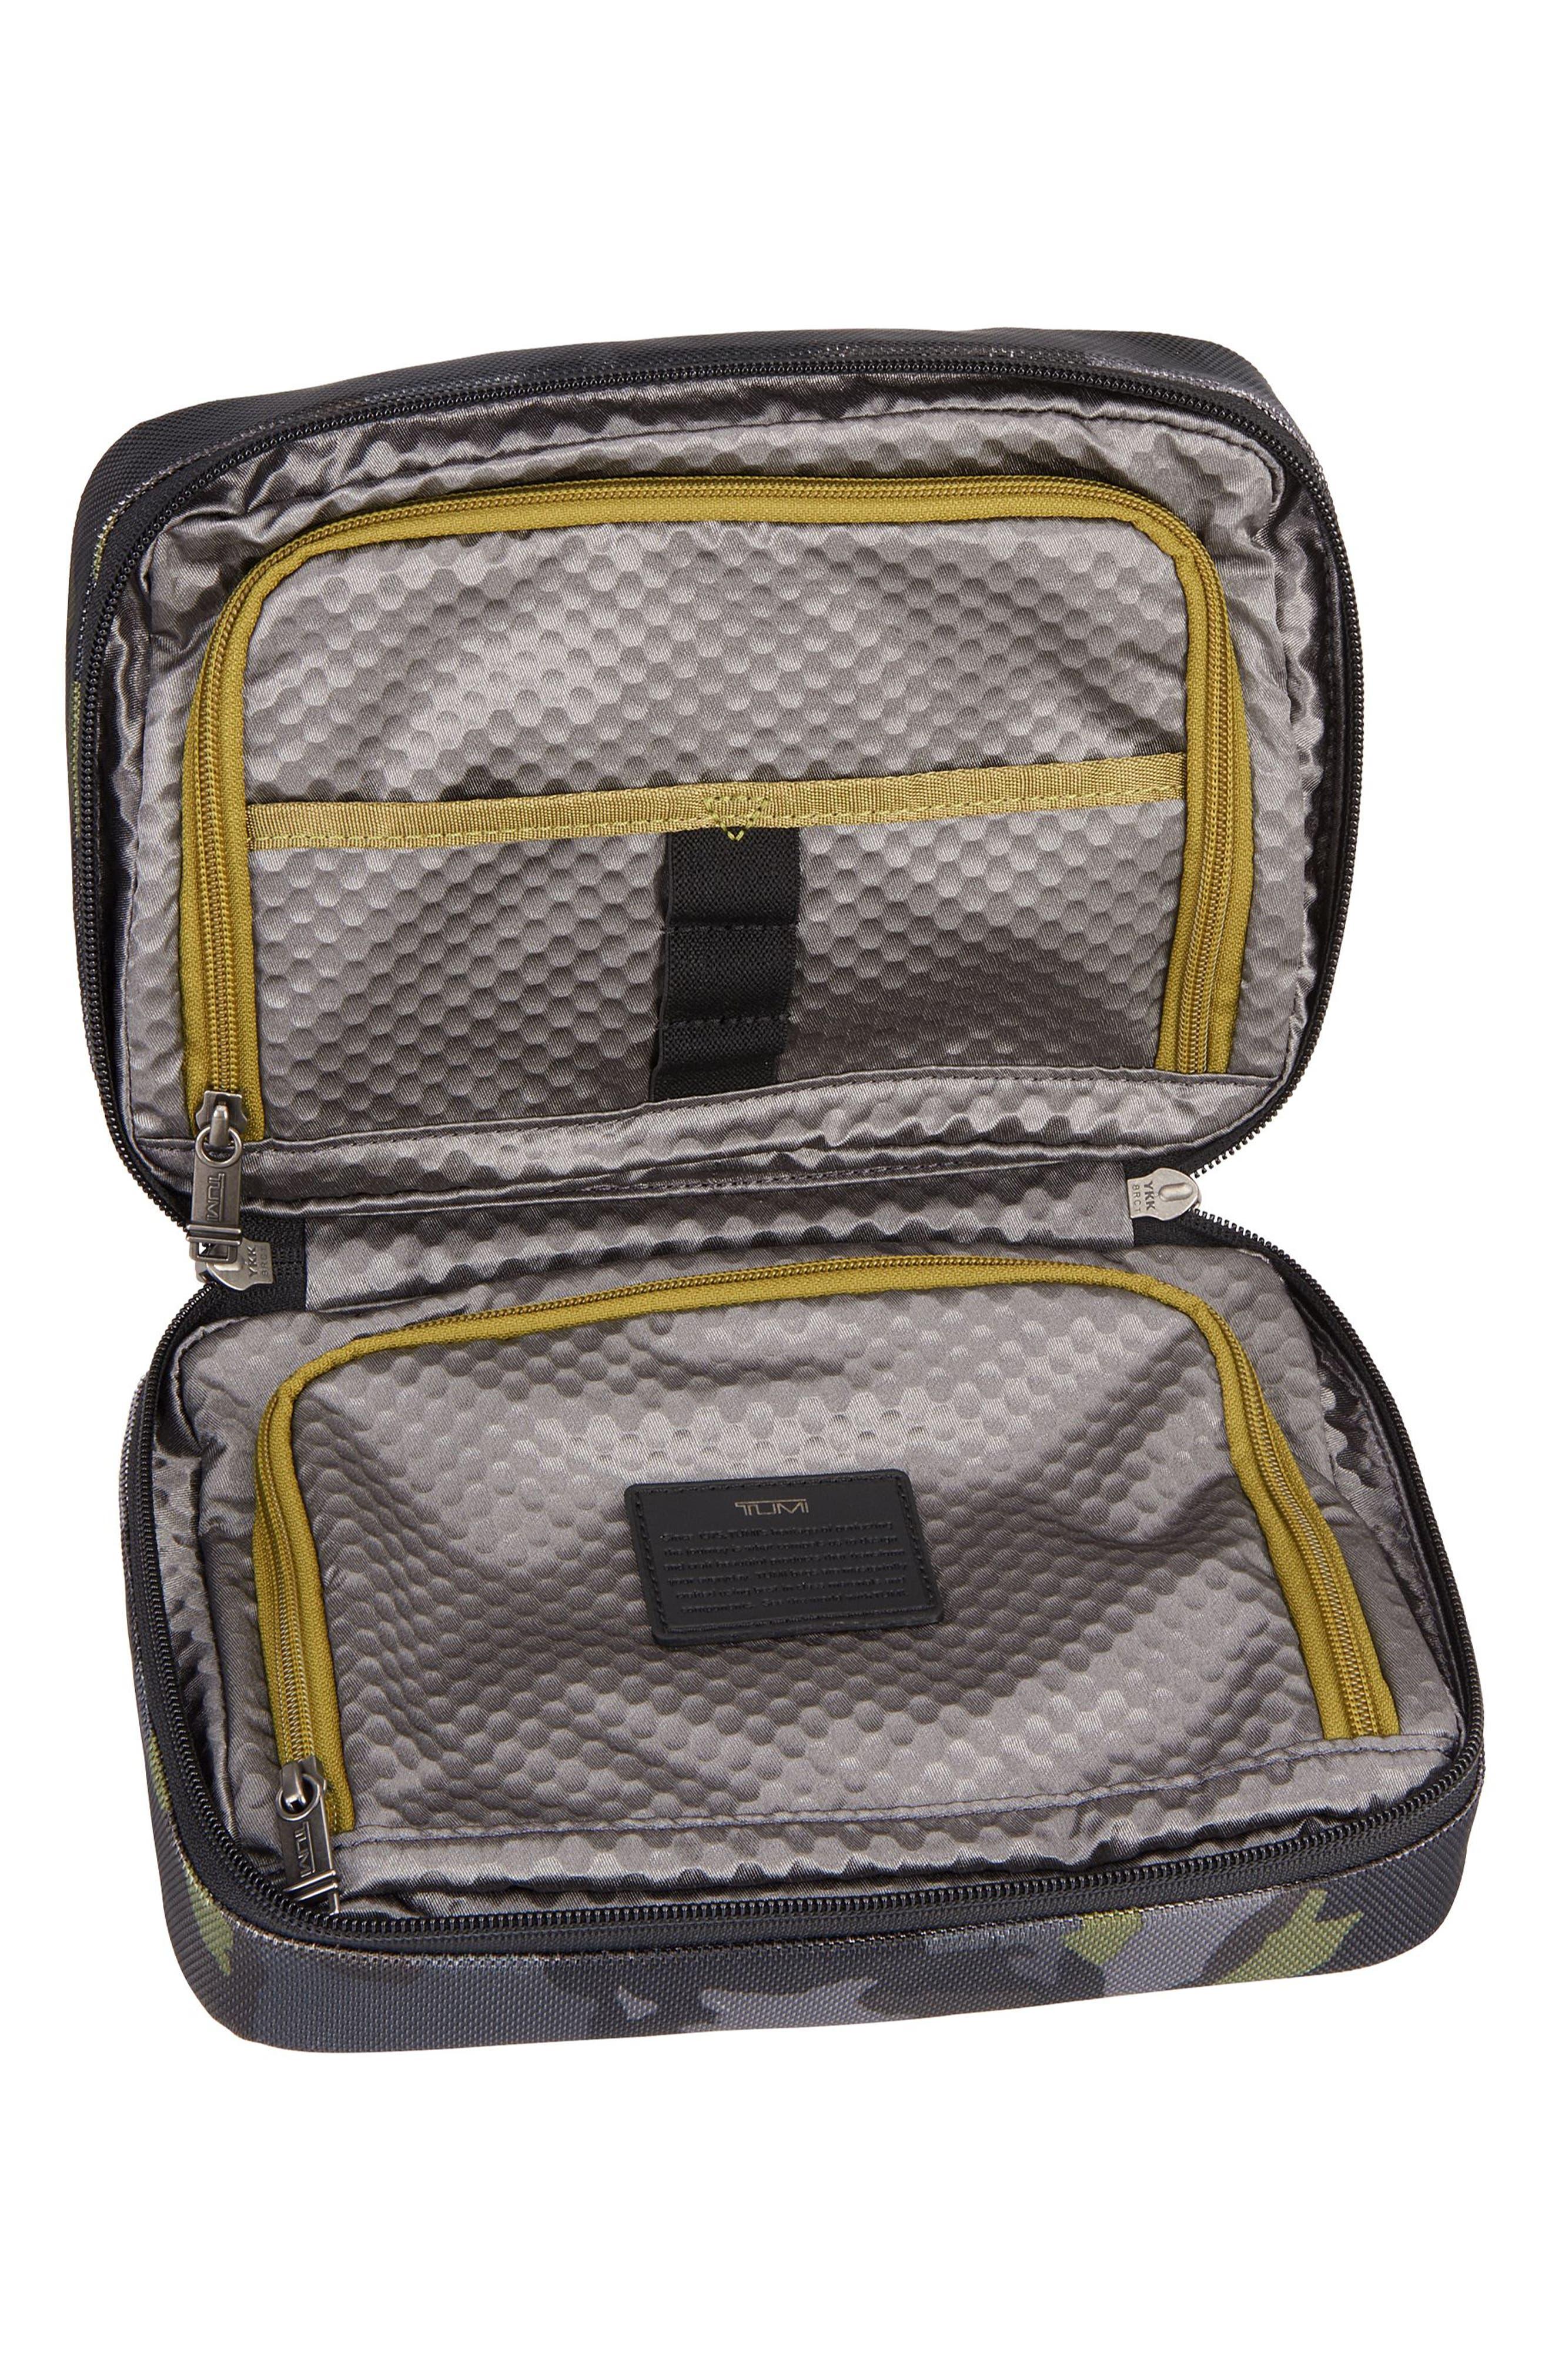 Alpha Bravo - Reno Travel Kit,                             Alternate thumbnail 2, color,                             Green Camo